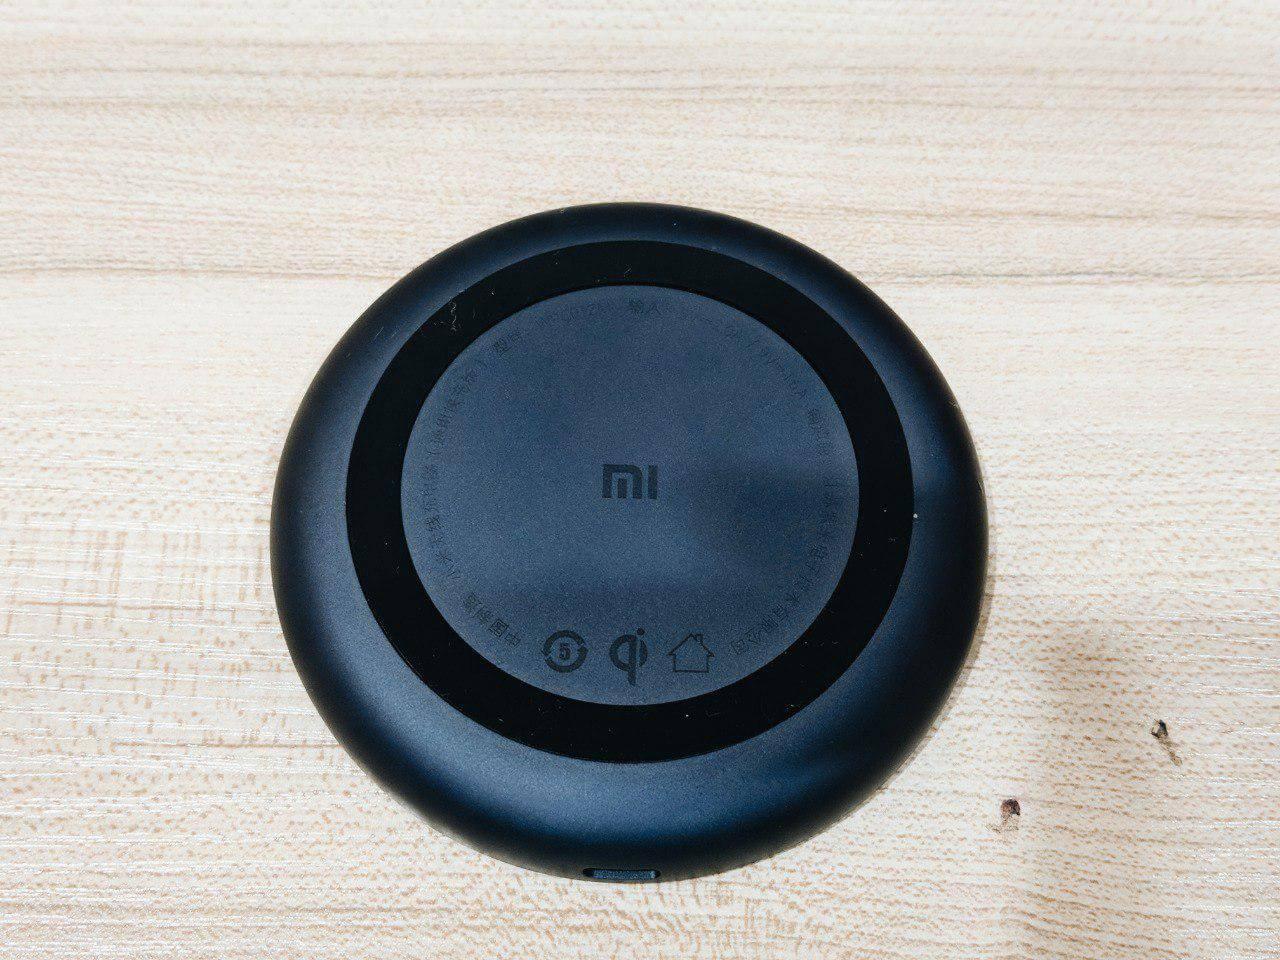 xiaomi 10w wireless charger bottom view